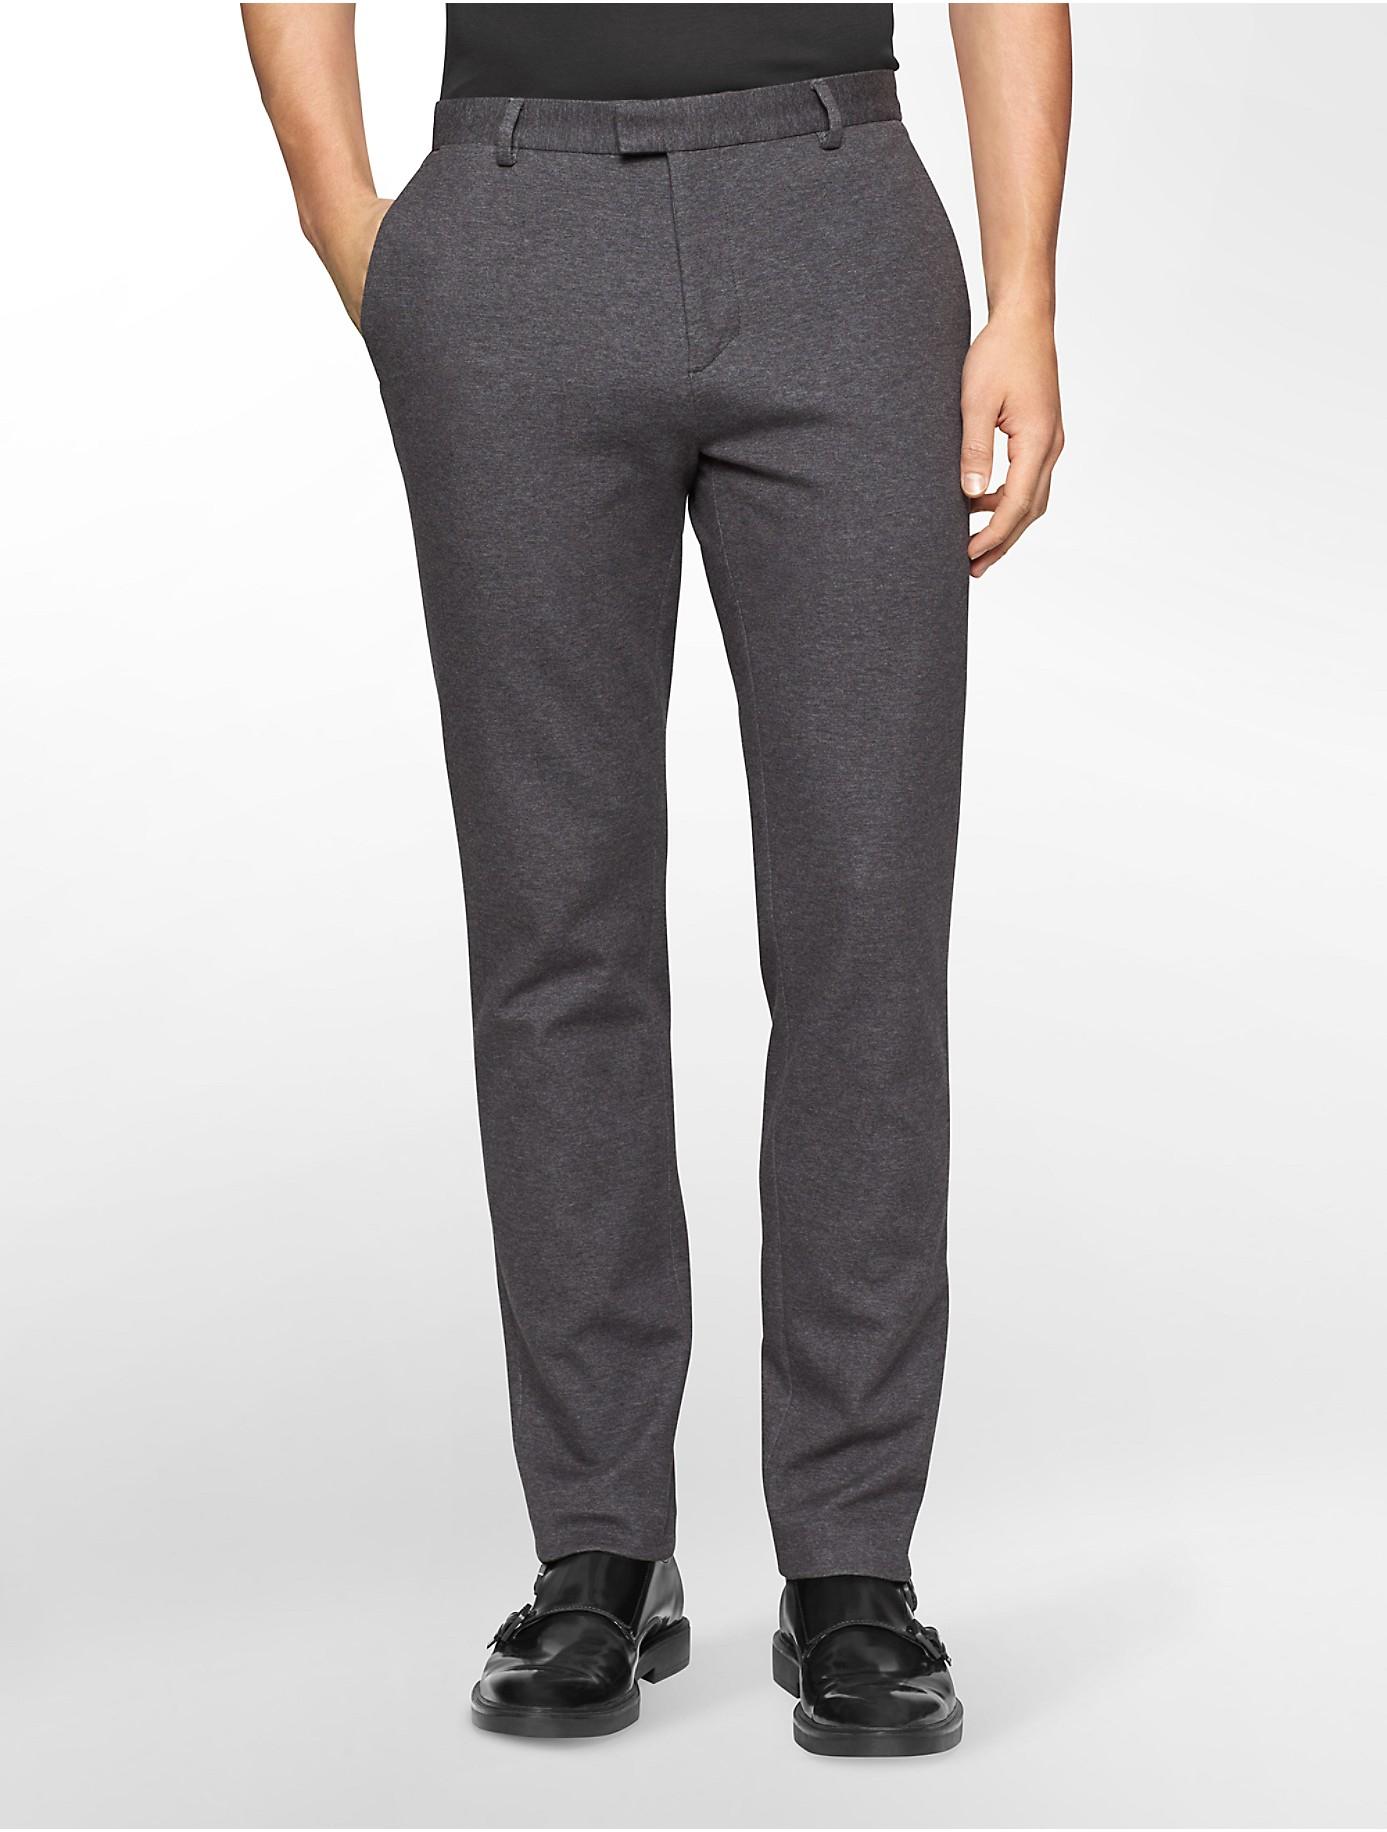 Calvin klein White Label Slim Fit Ponte Knit Dress Pants in Gray ...